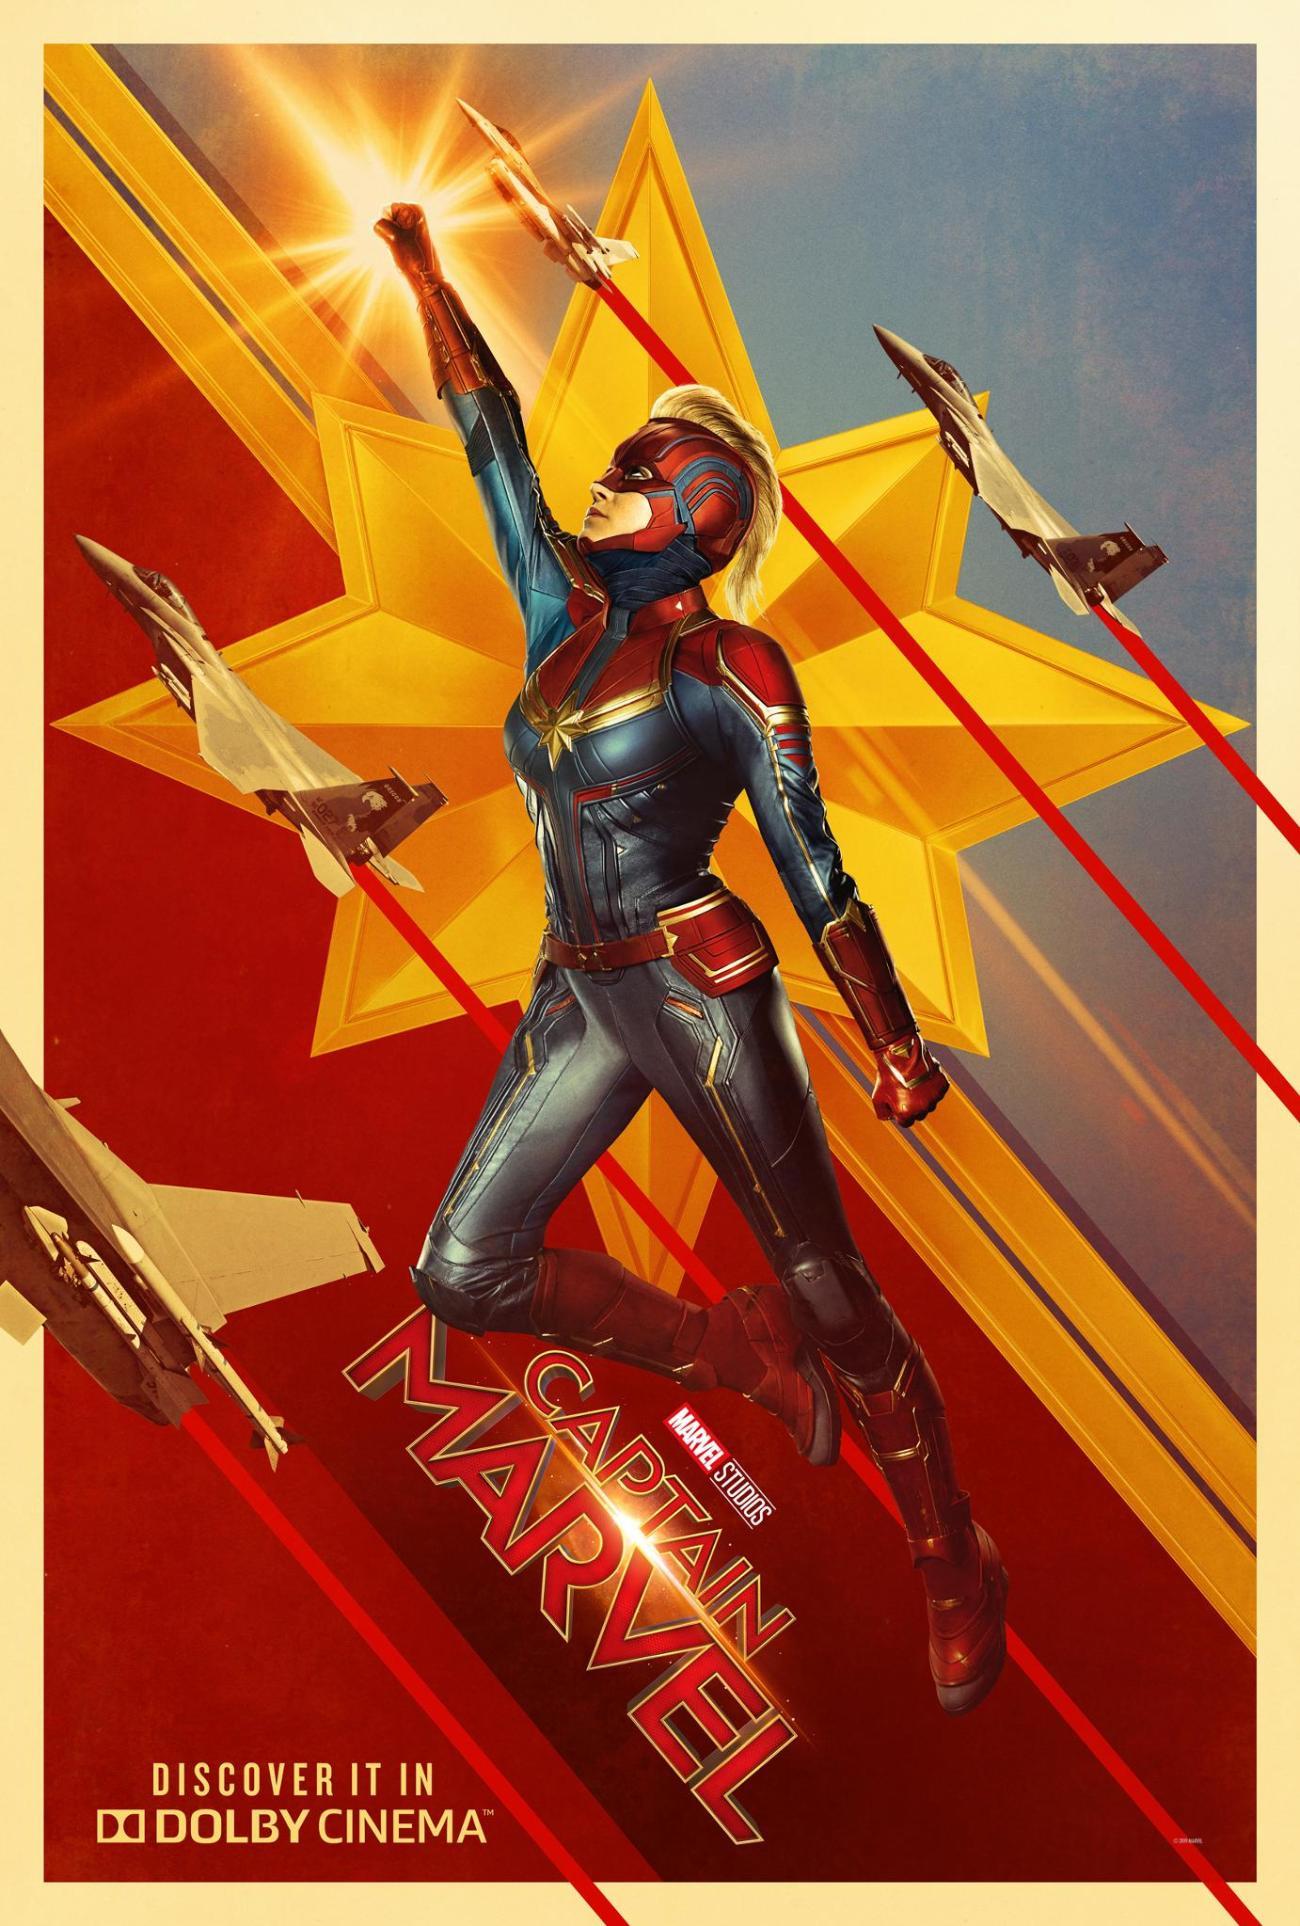 Póster Dolby de Captain Marvel (2019). Imagen: Dolby Cinema Twitter (@DolbyCinema).